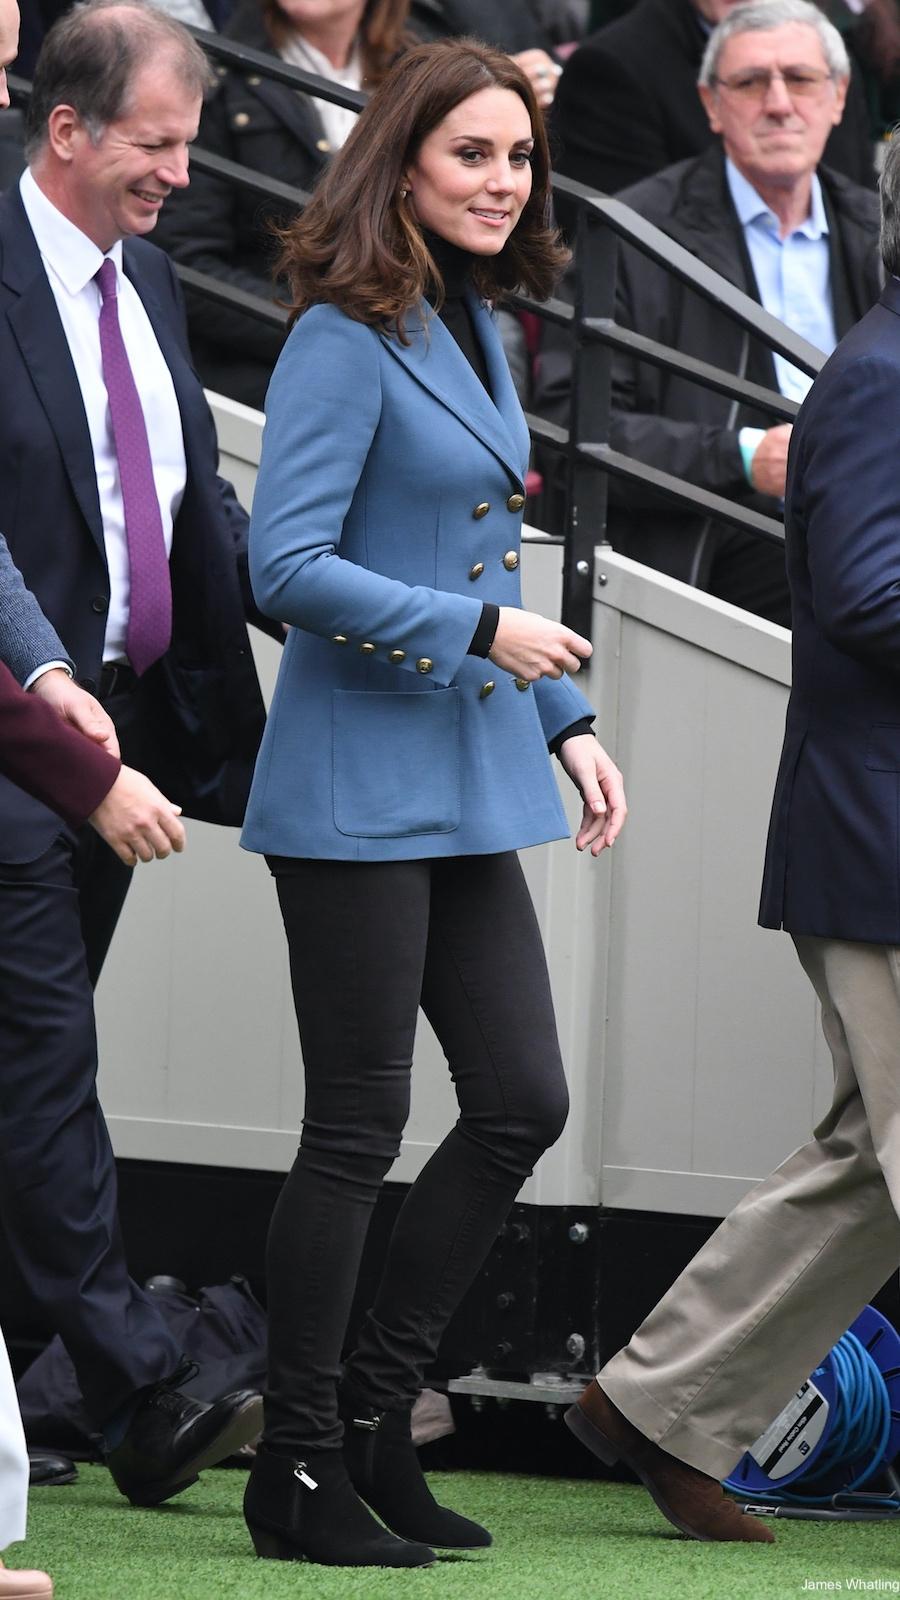 Kate Middleton wearing blue Philosophy jacket in London